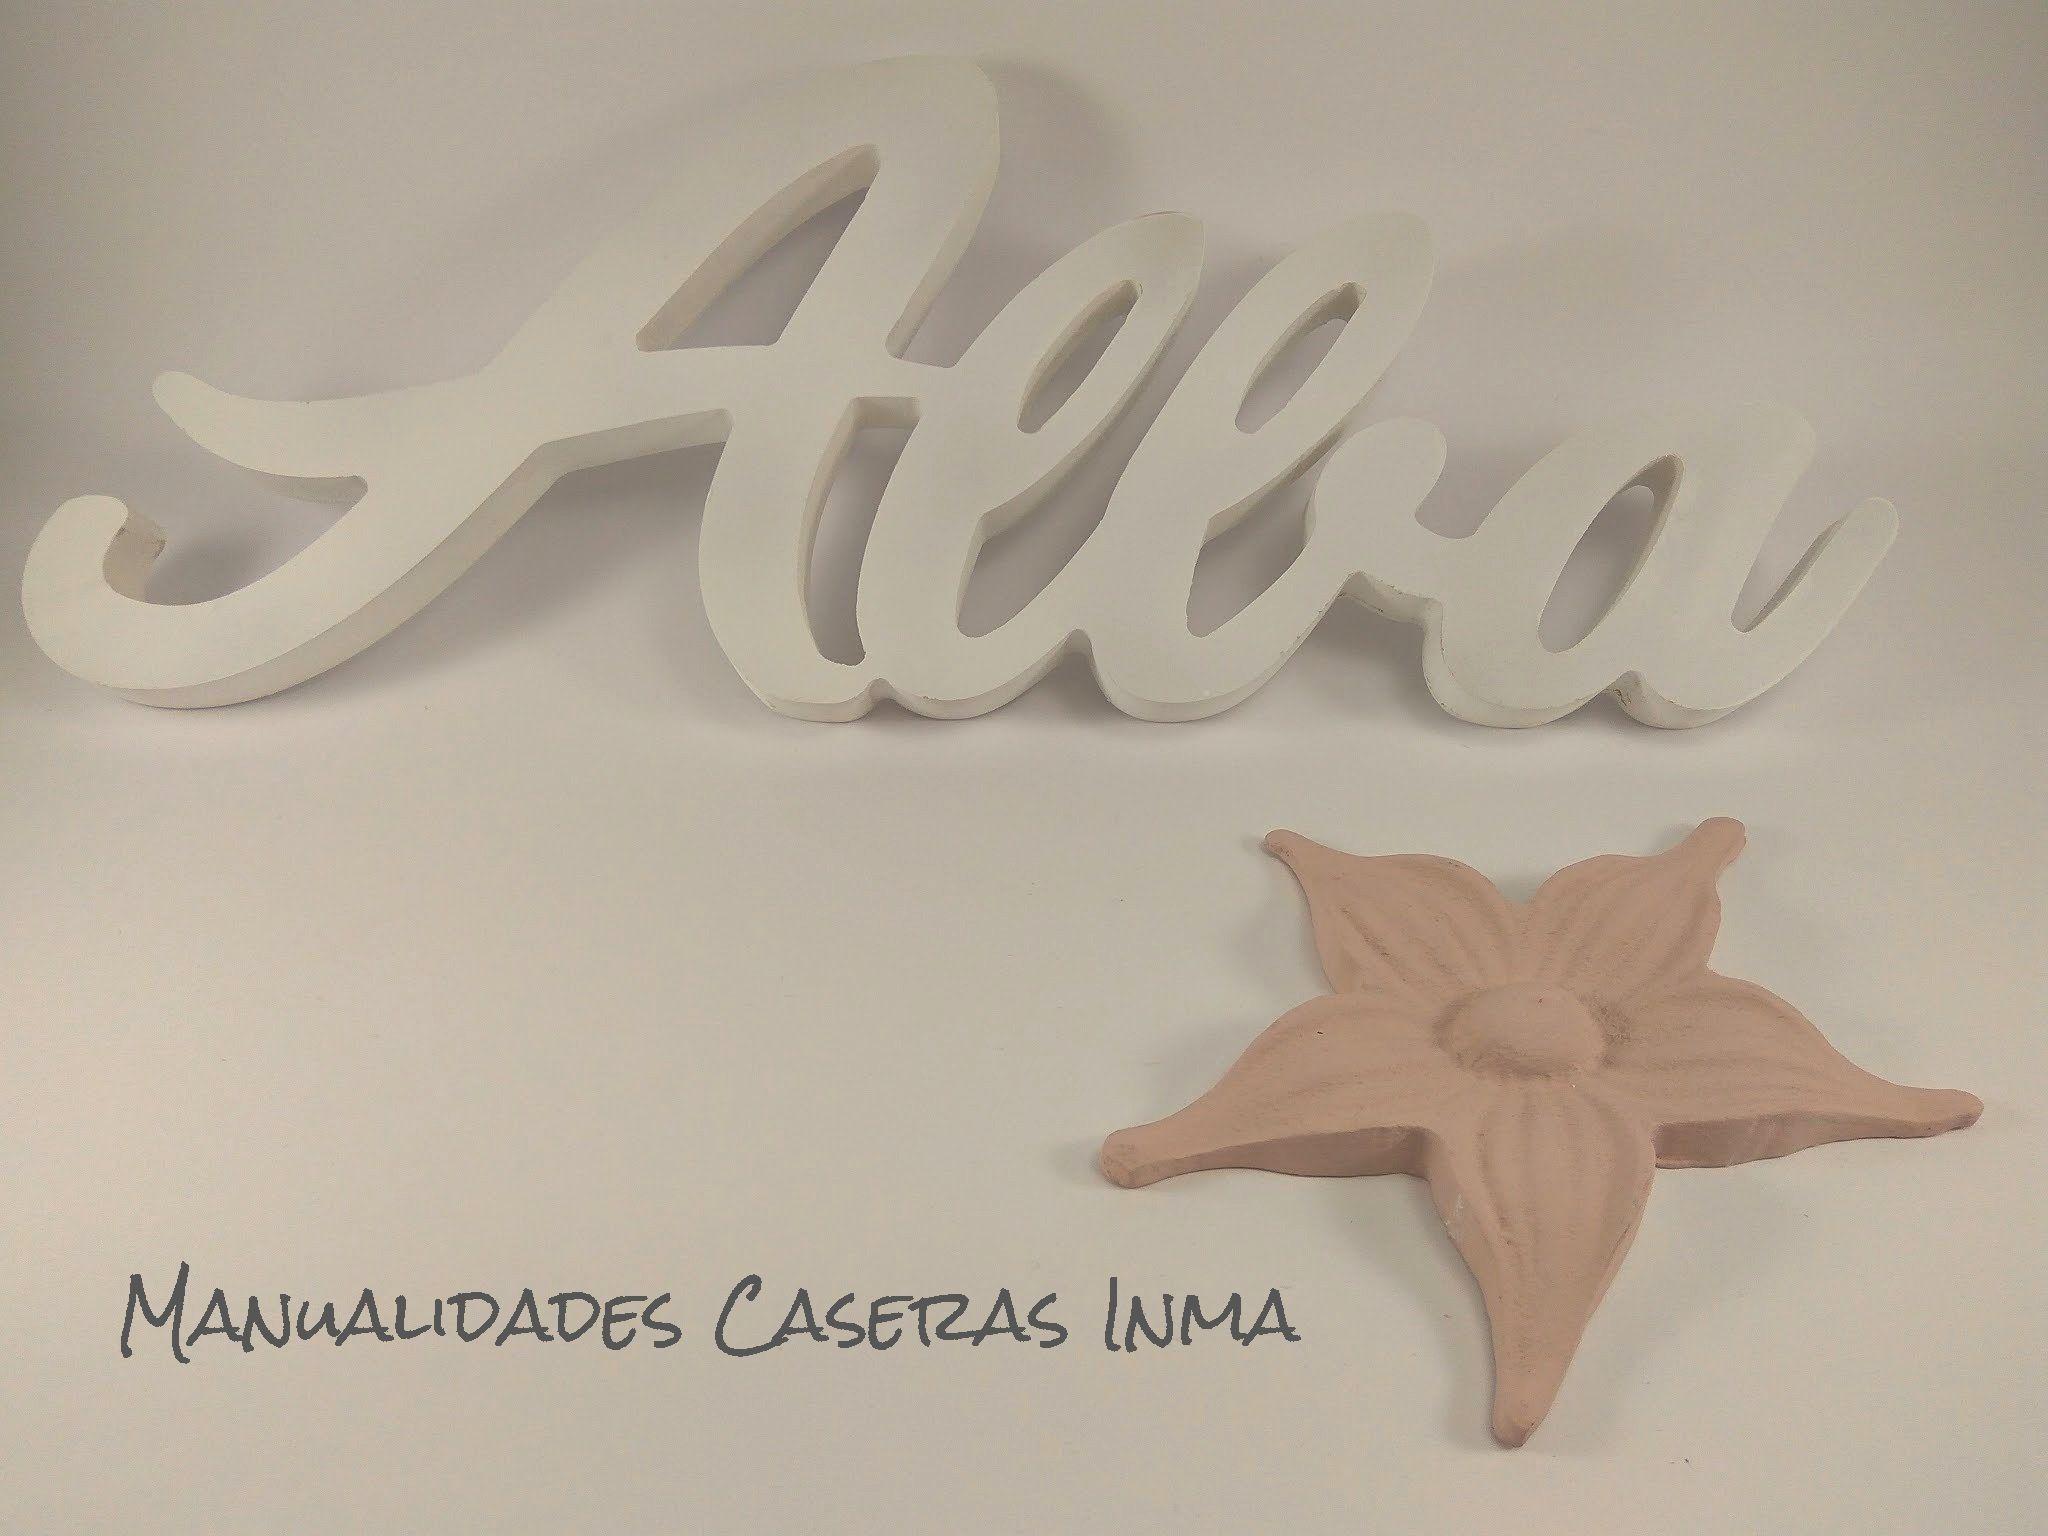 Manualidades Caseras Inma_ Nombres de madera Alba